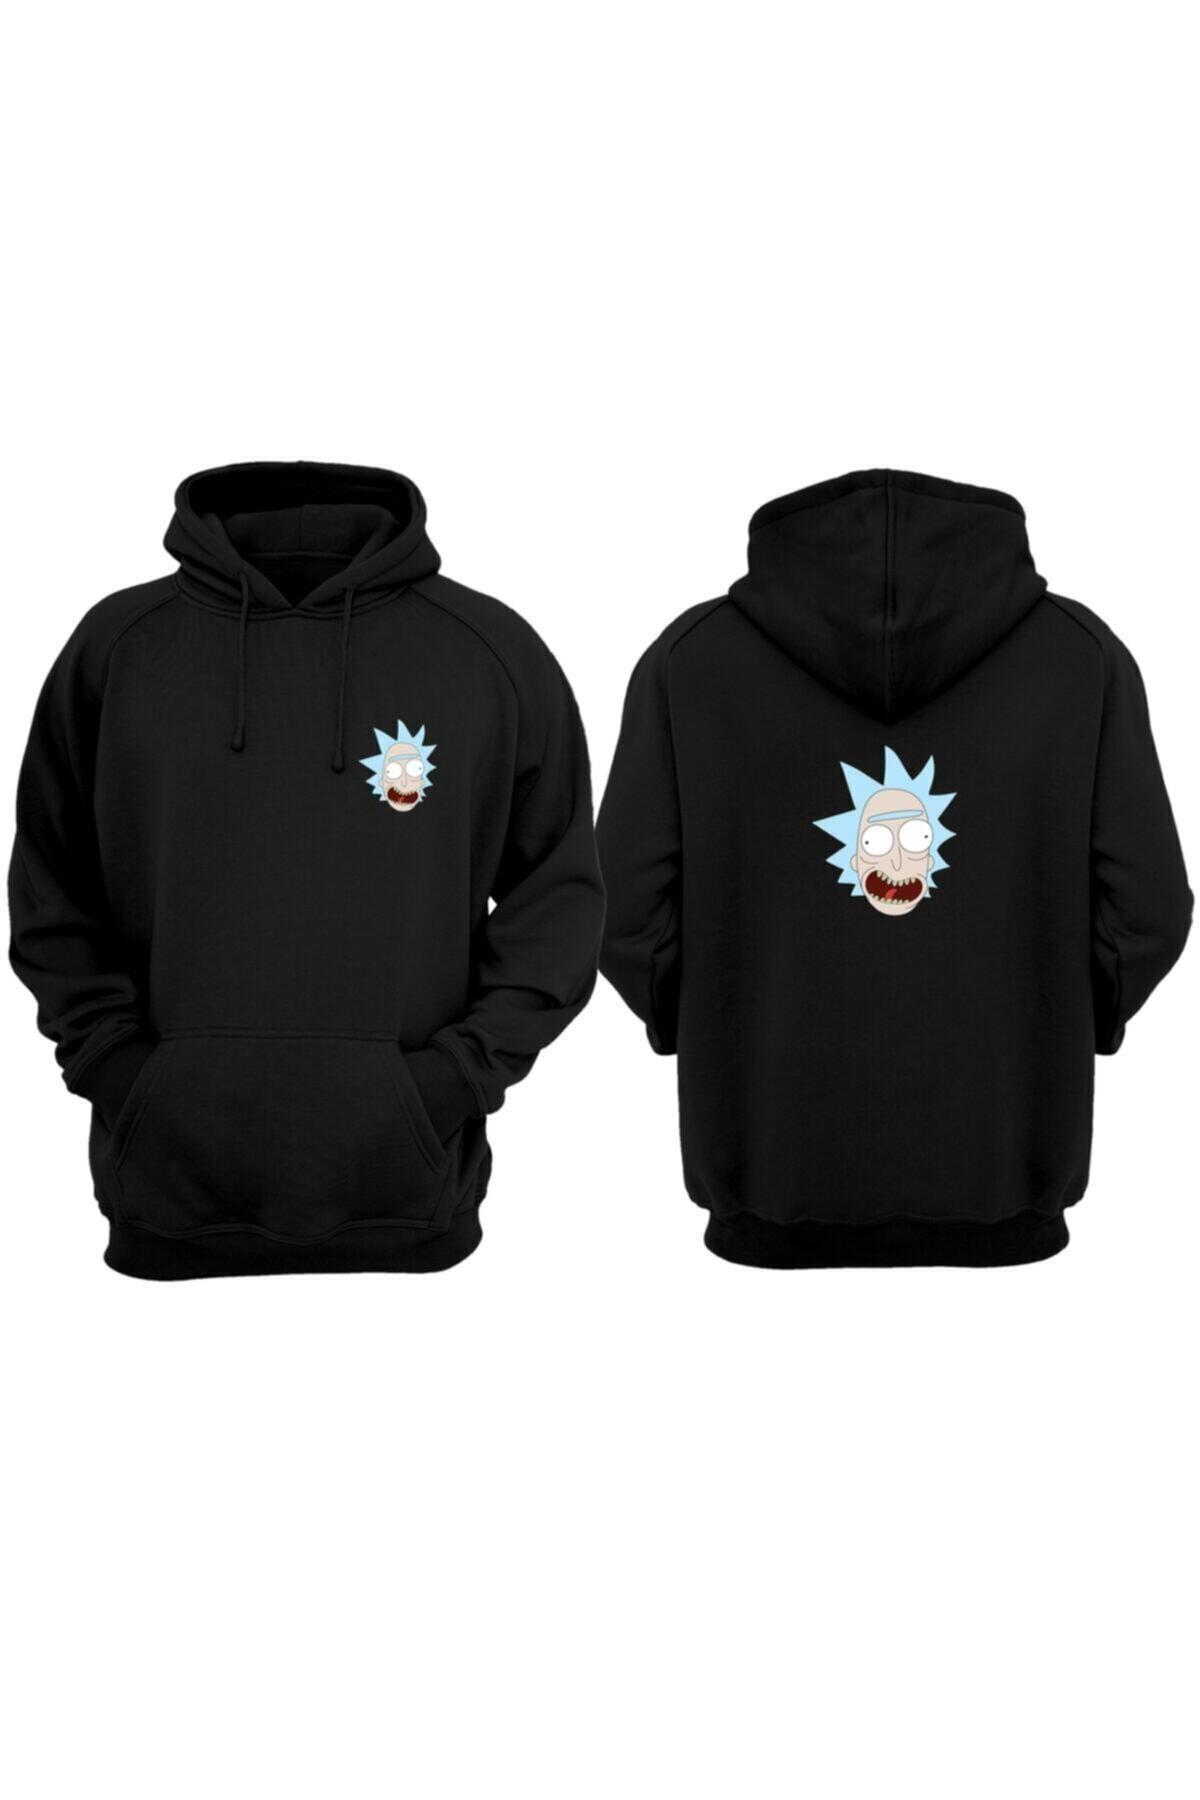 VectorWear Rick And Morty  Sweatshirt Hoodie 1